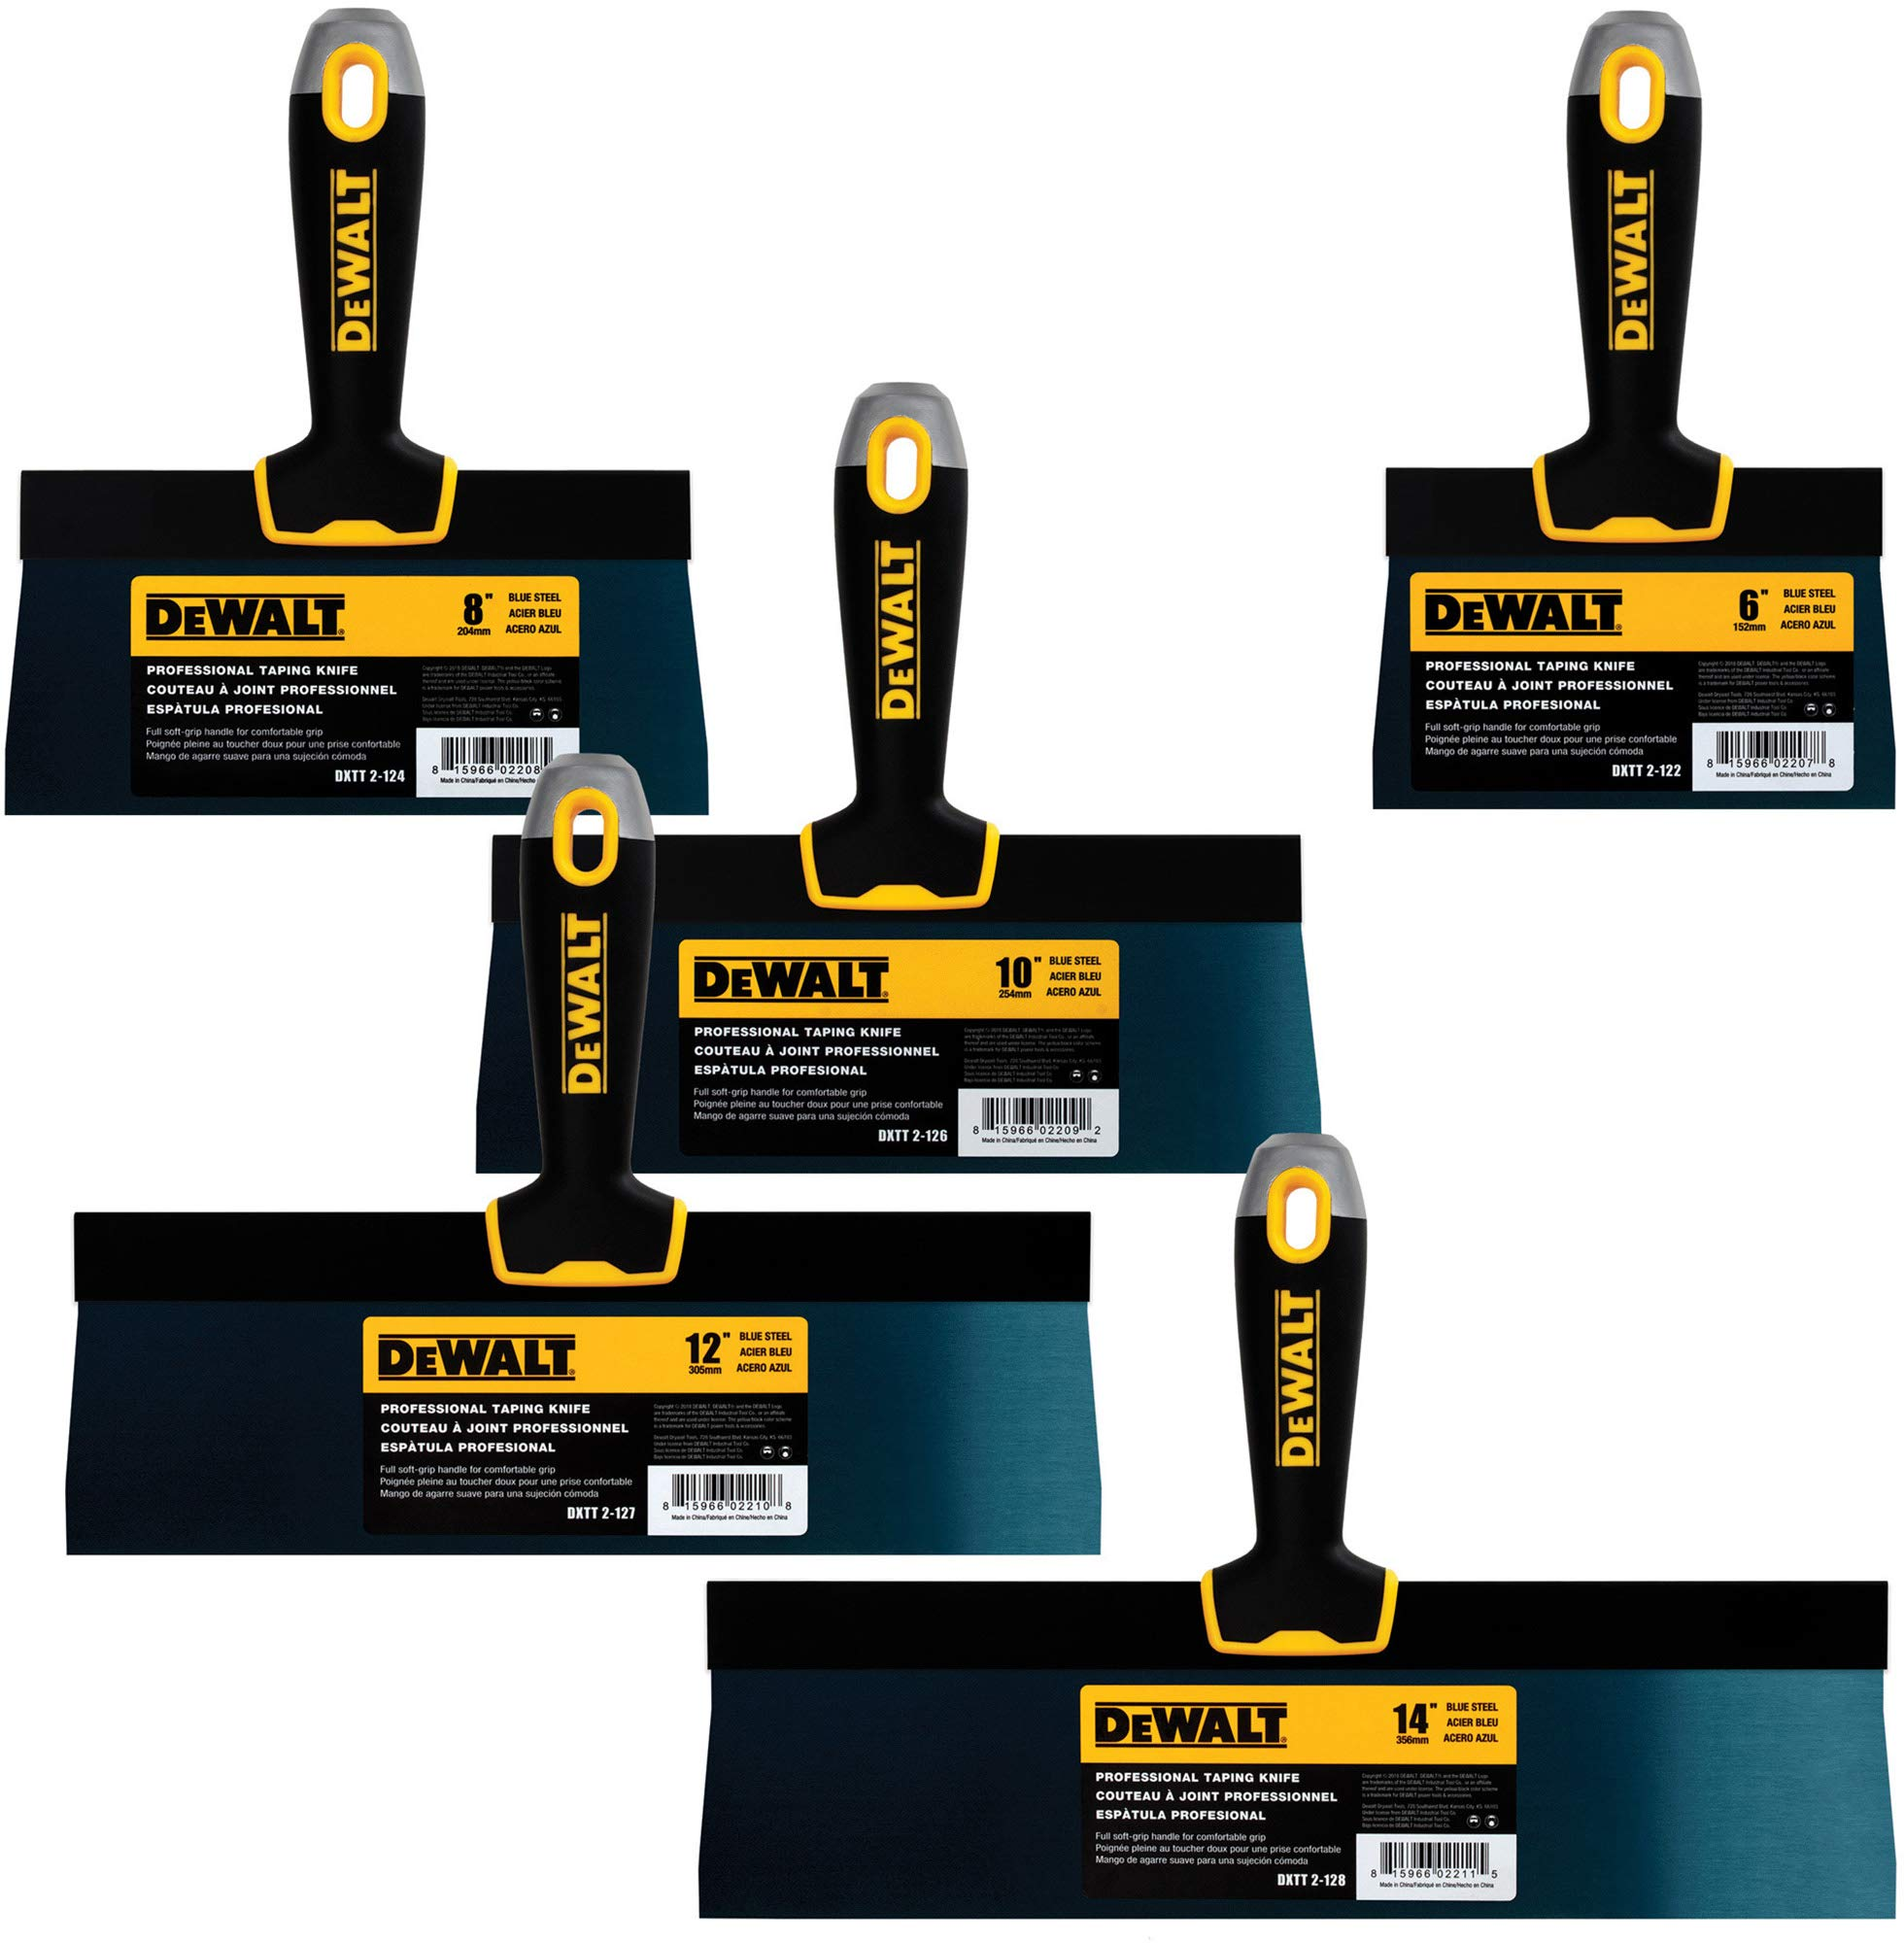 DEWALT Blue Steel Taping Knife 4-Pack | 8/10/12/14-Inches + FREE 6-Inch BONUS | Soft Grip Handles| DXTT-3-162 by DEWALT